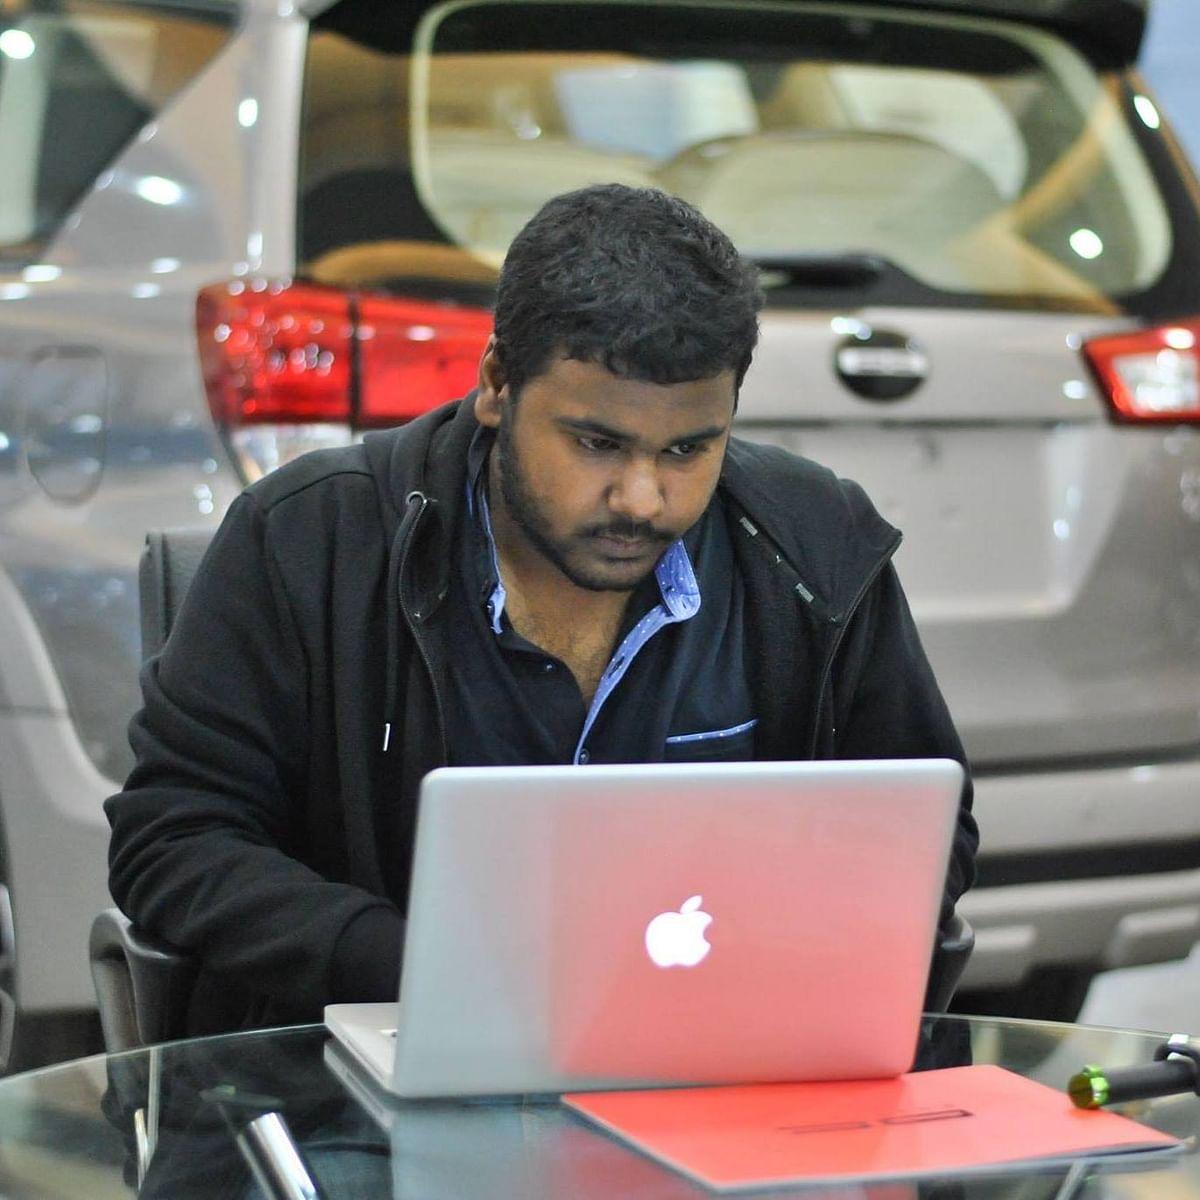 Indrajeet Bhuyan has developed a solution called WannaSmile. (Photo Courtesy: Indrajeet Bhuyan)